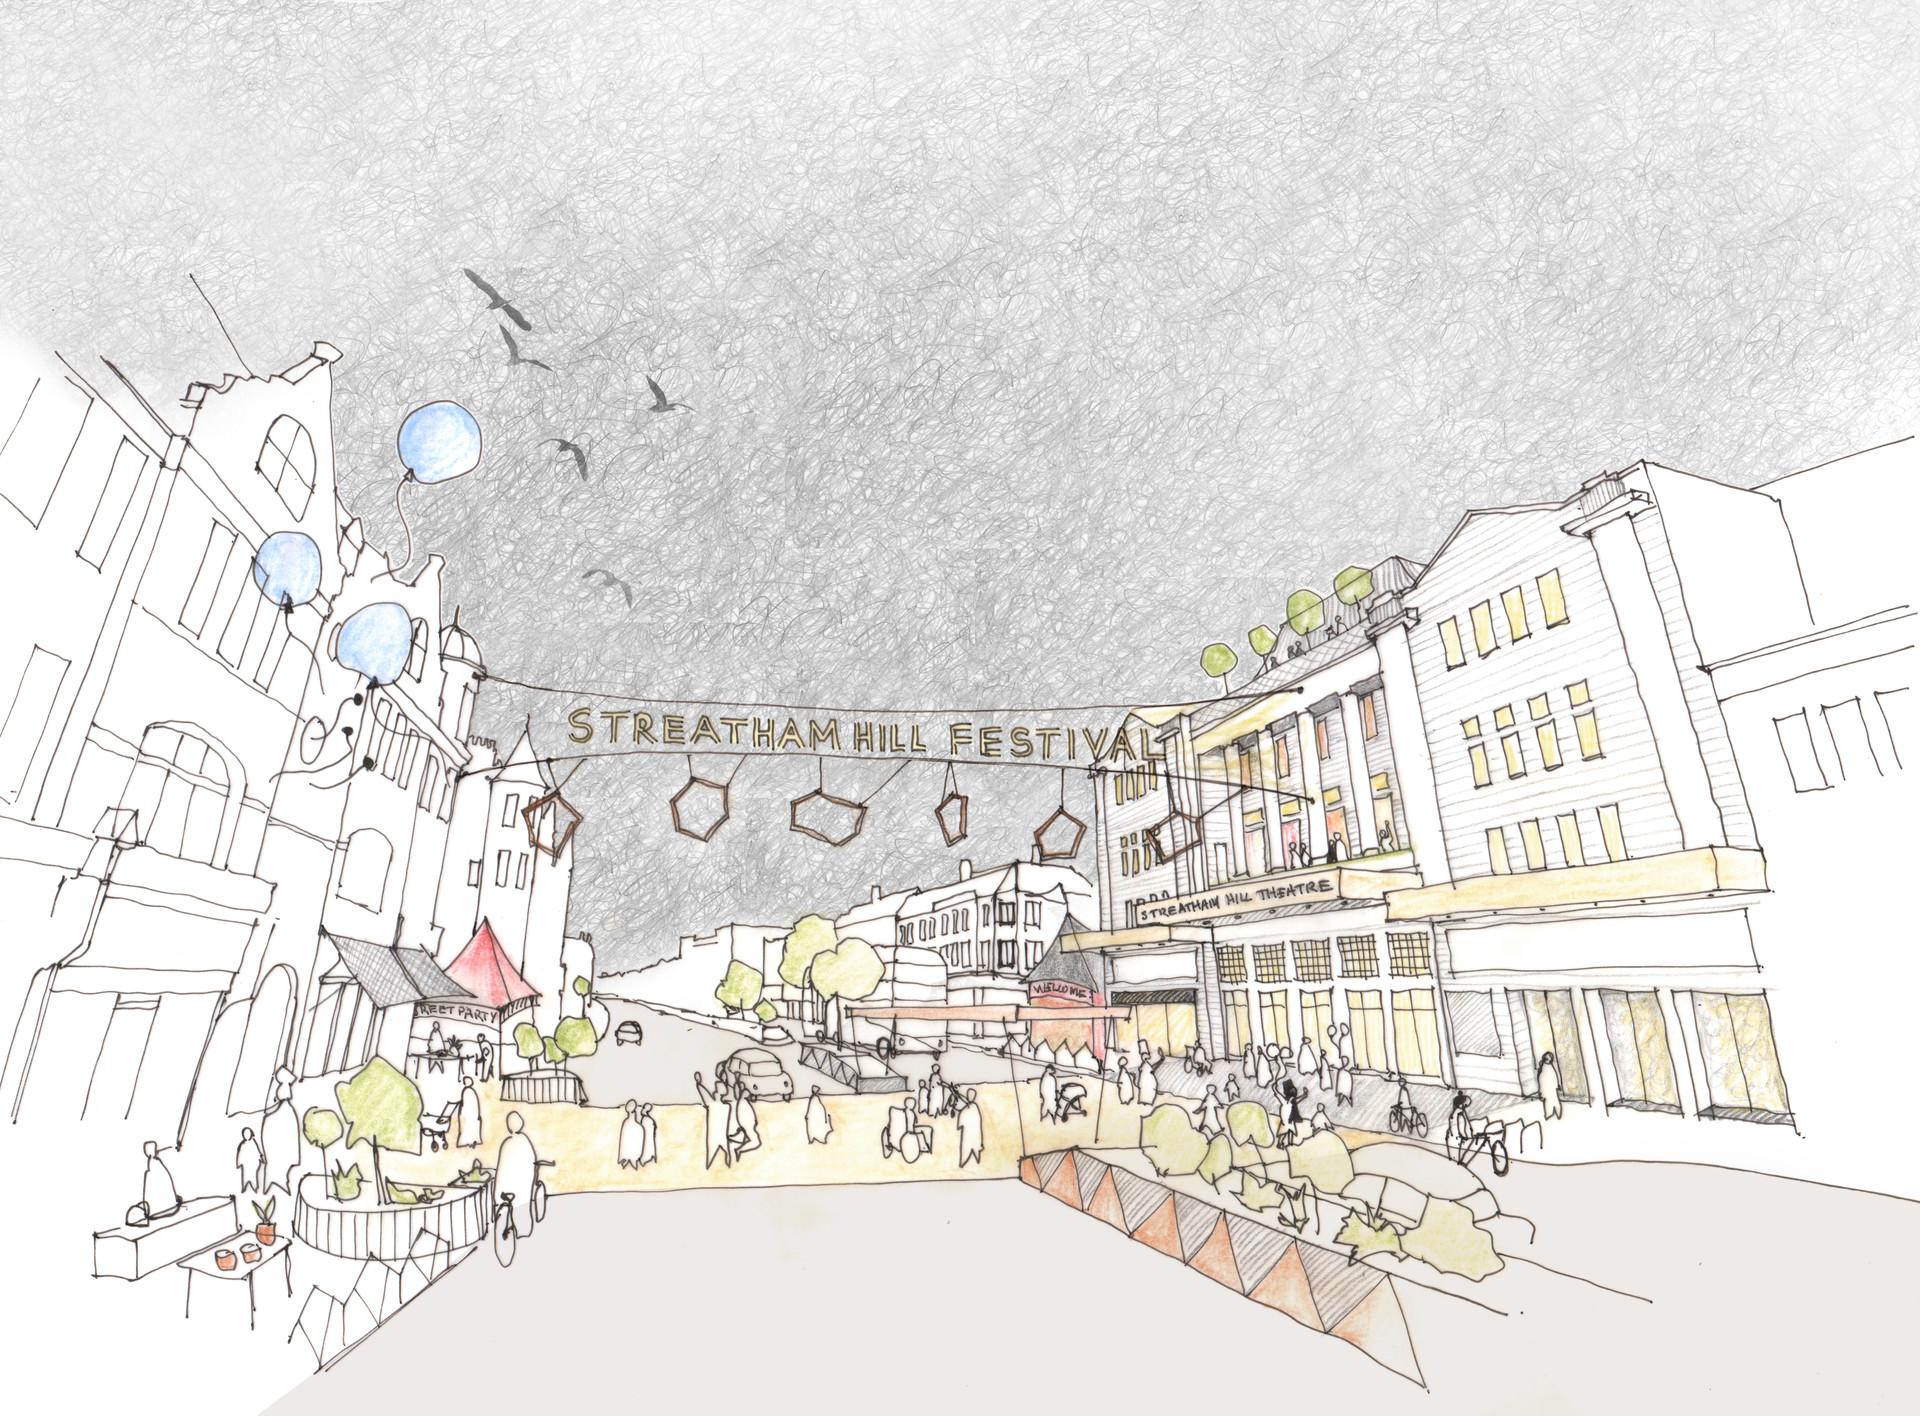 Streatham Hill Theatre Sketch Vision